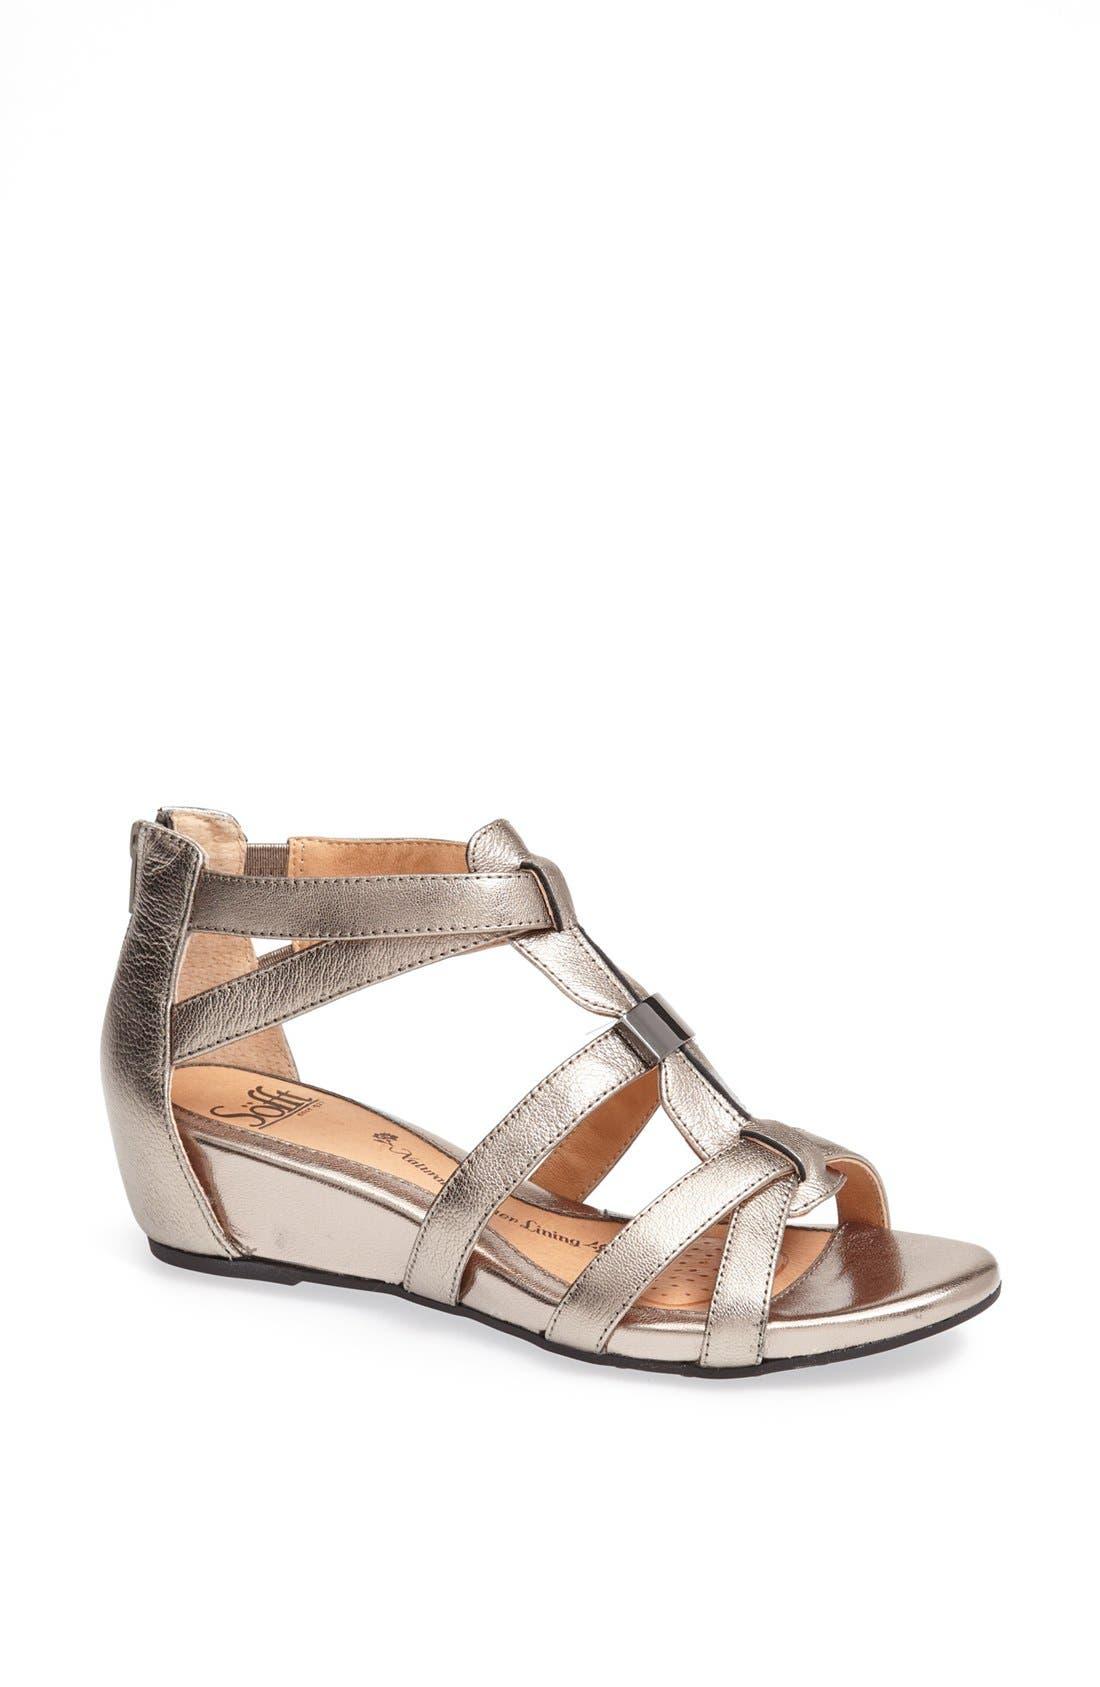 Main Image - Söfft 'Bernia' Sandal